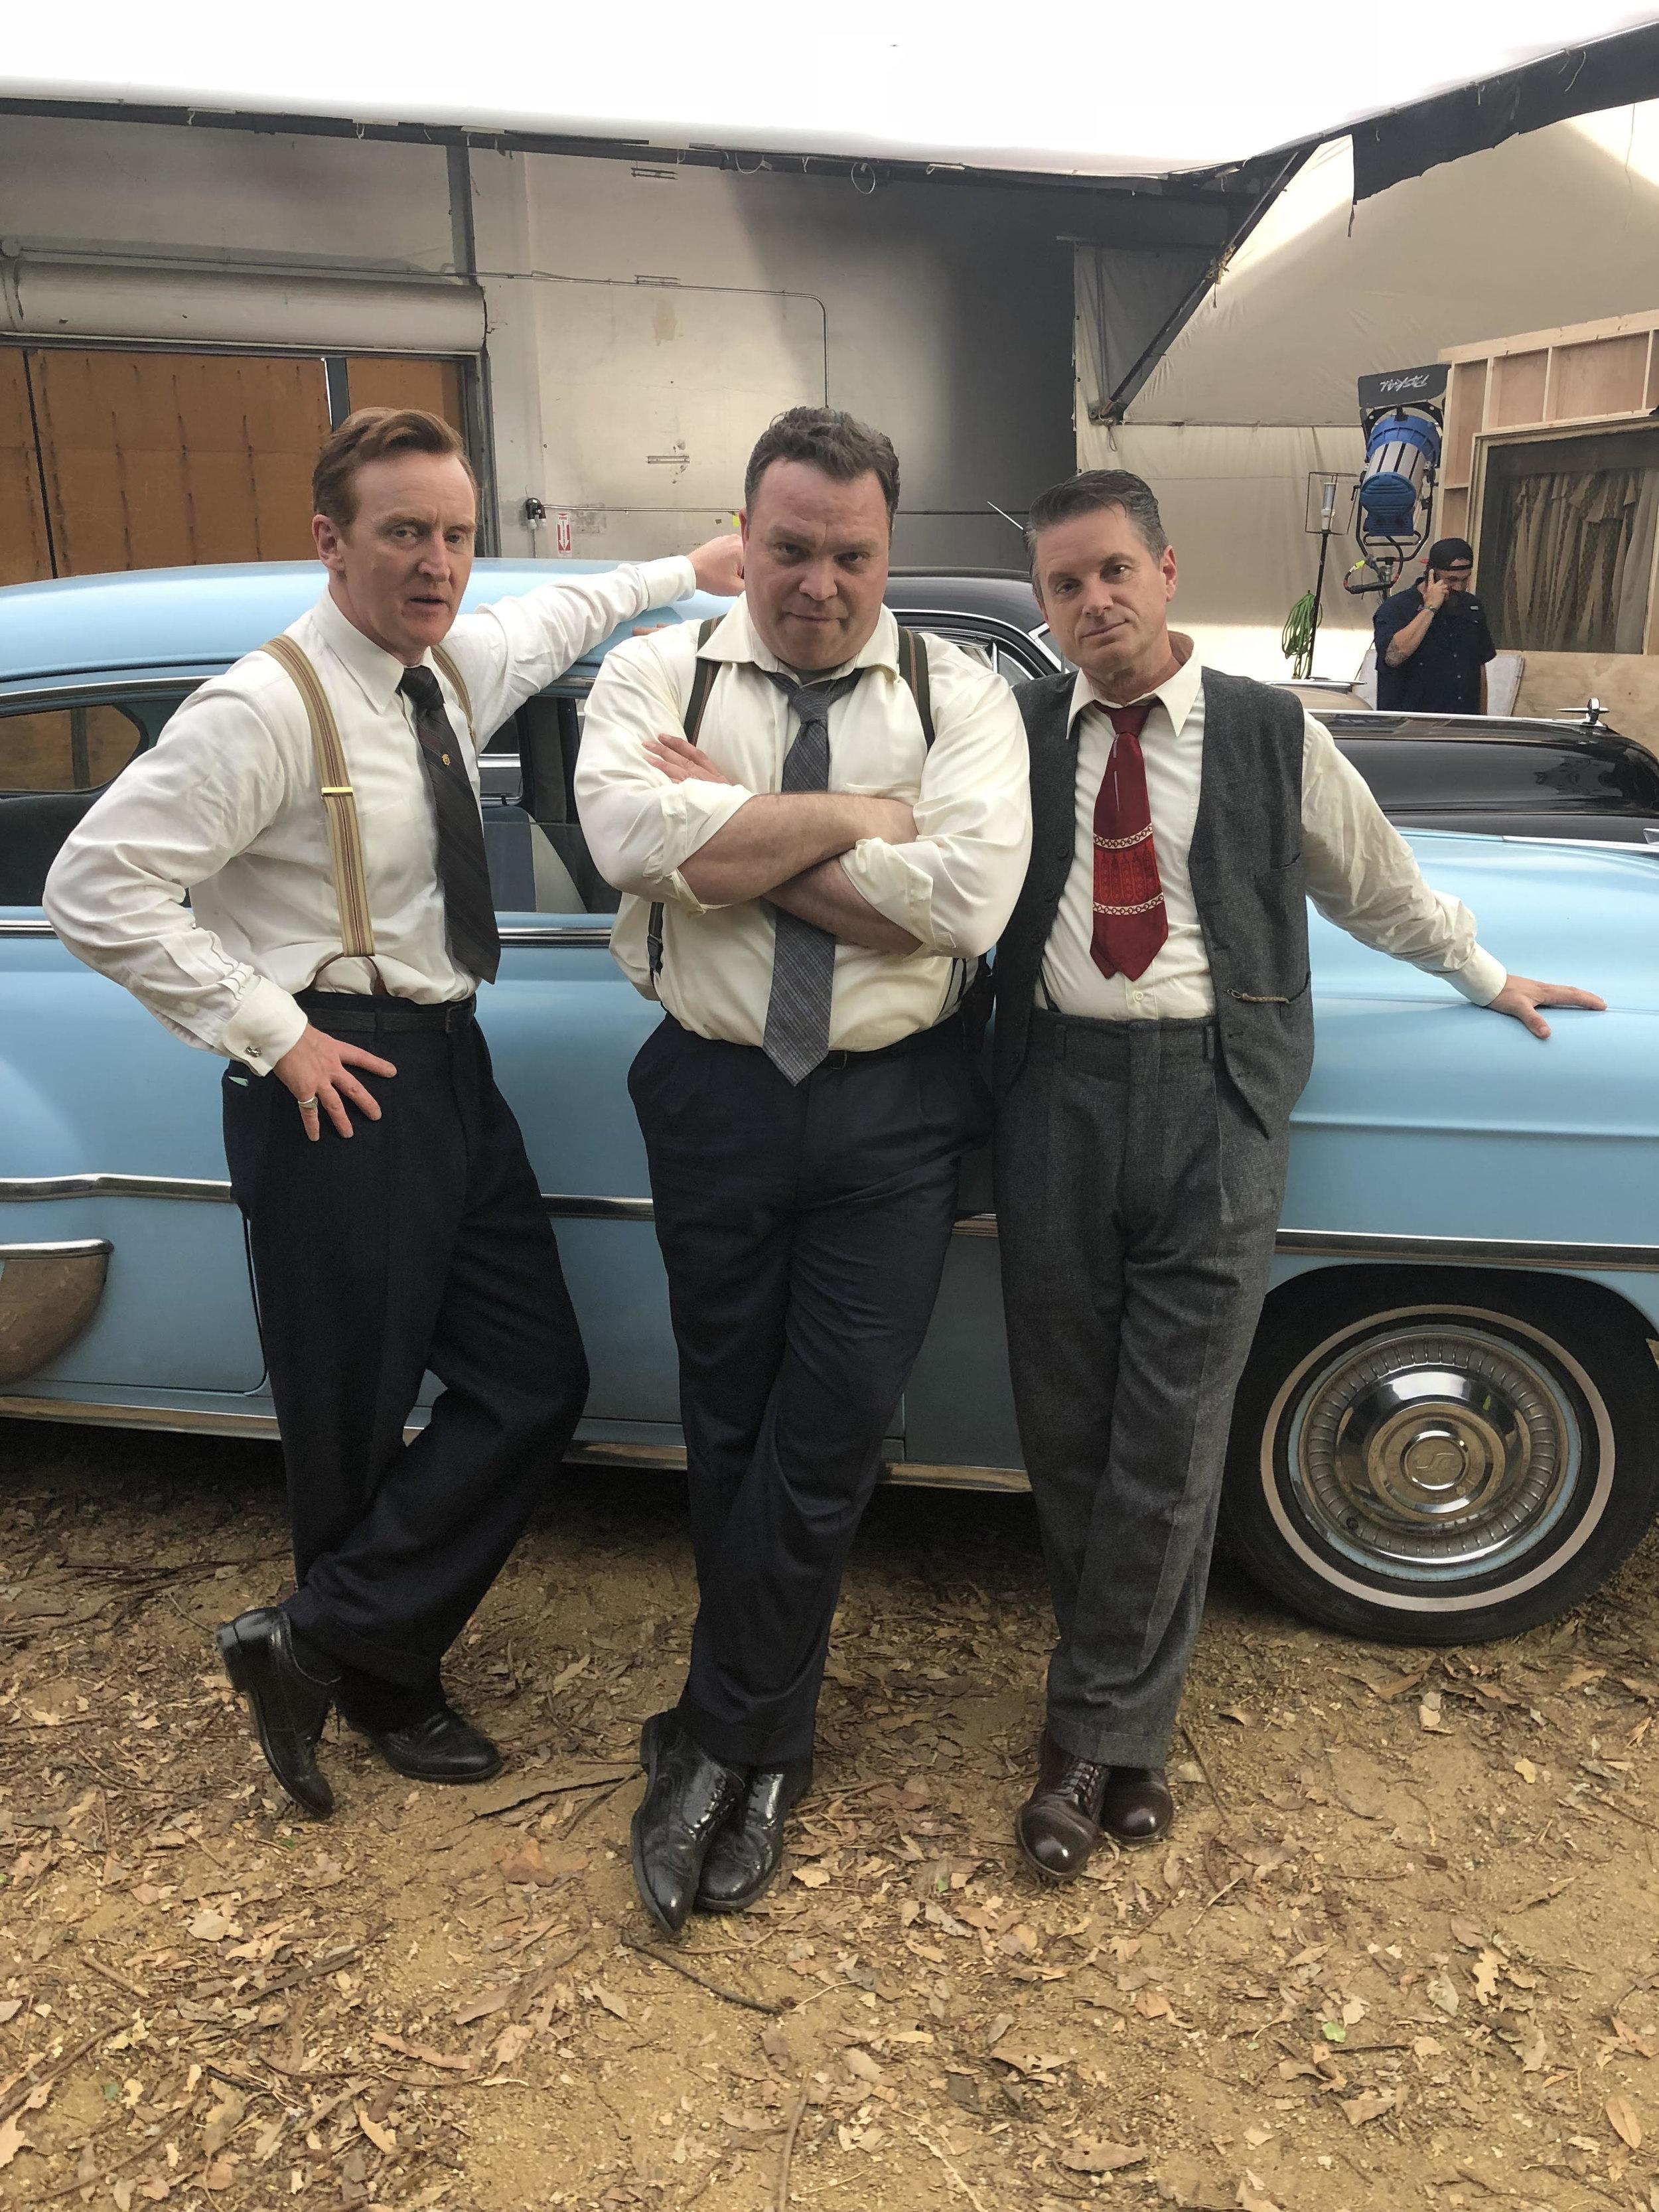 Cruisin' to do some bruisin. Tony Curran (Dudley Smith), Drew Powell (Detective Carlisle) and Shea Wigham (Dick Stensland)   Photo courtesy Drew Powell